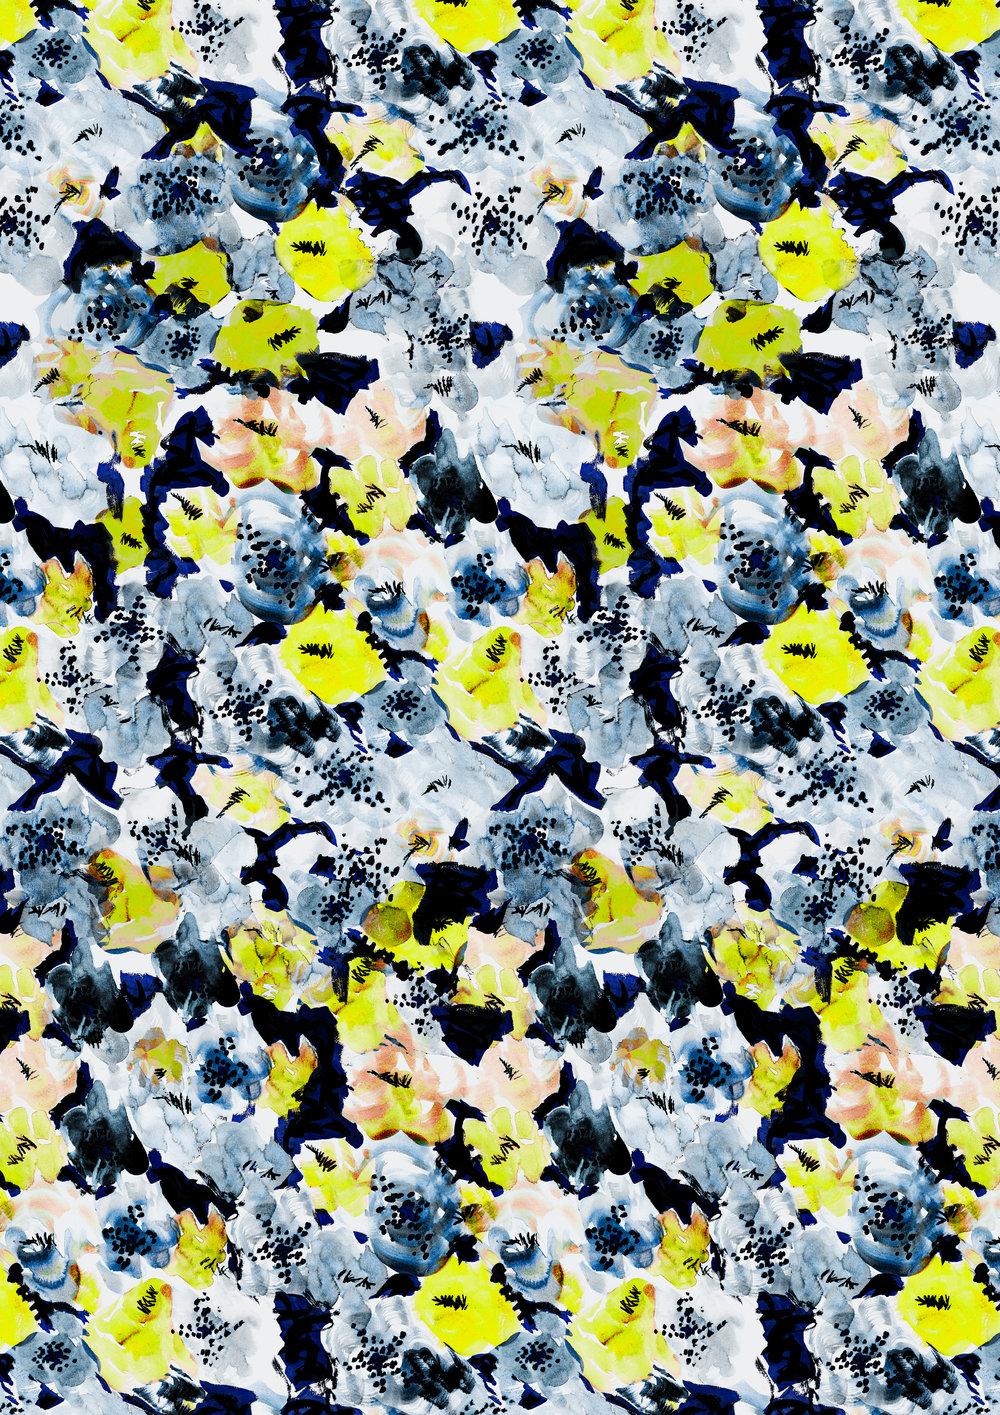 Mariposa print by Violet & wren